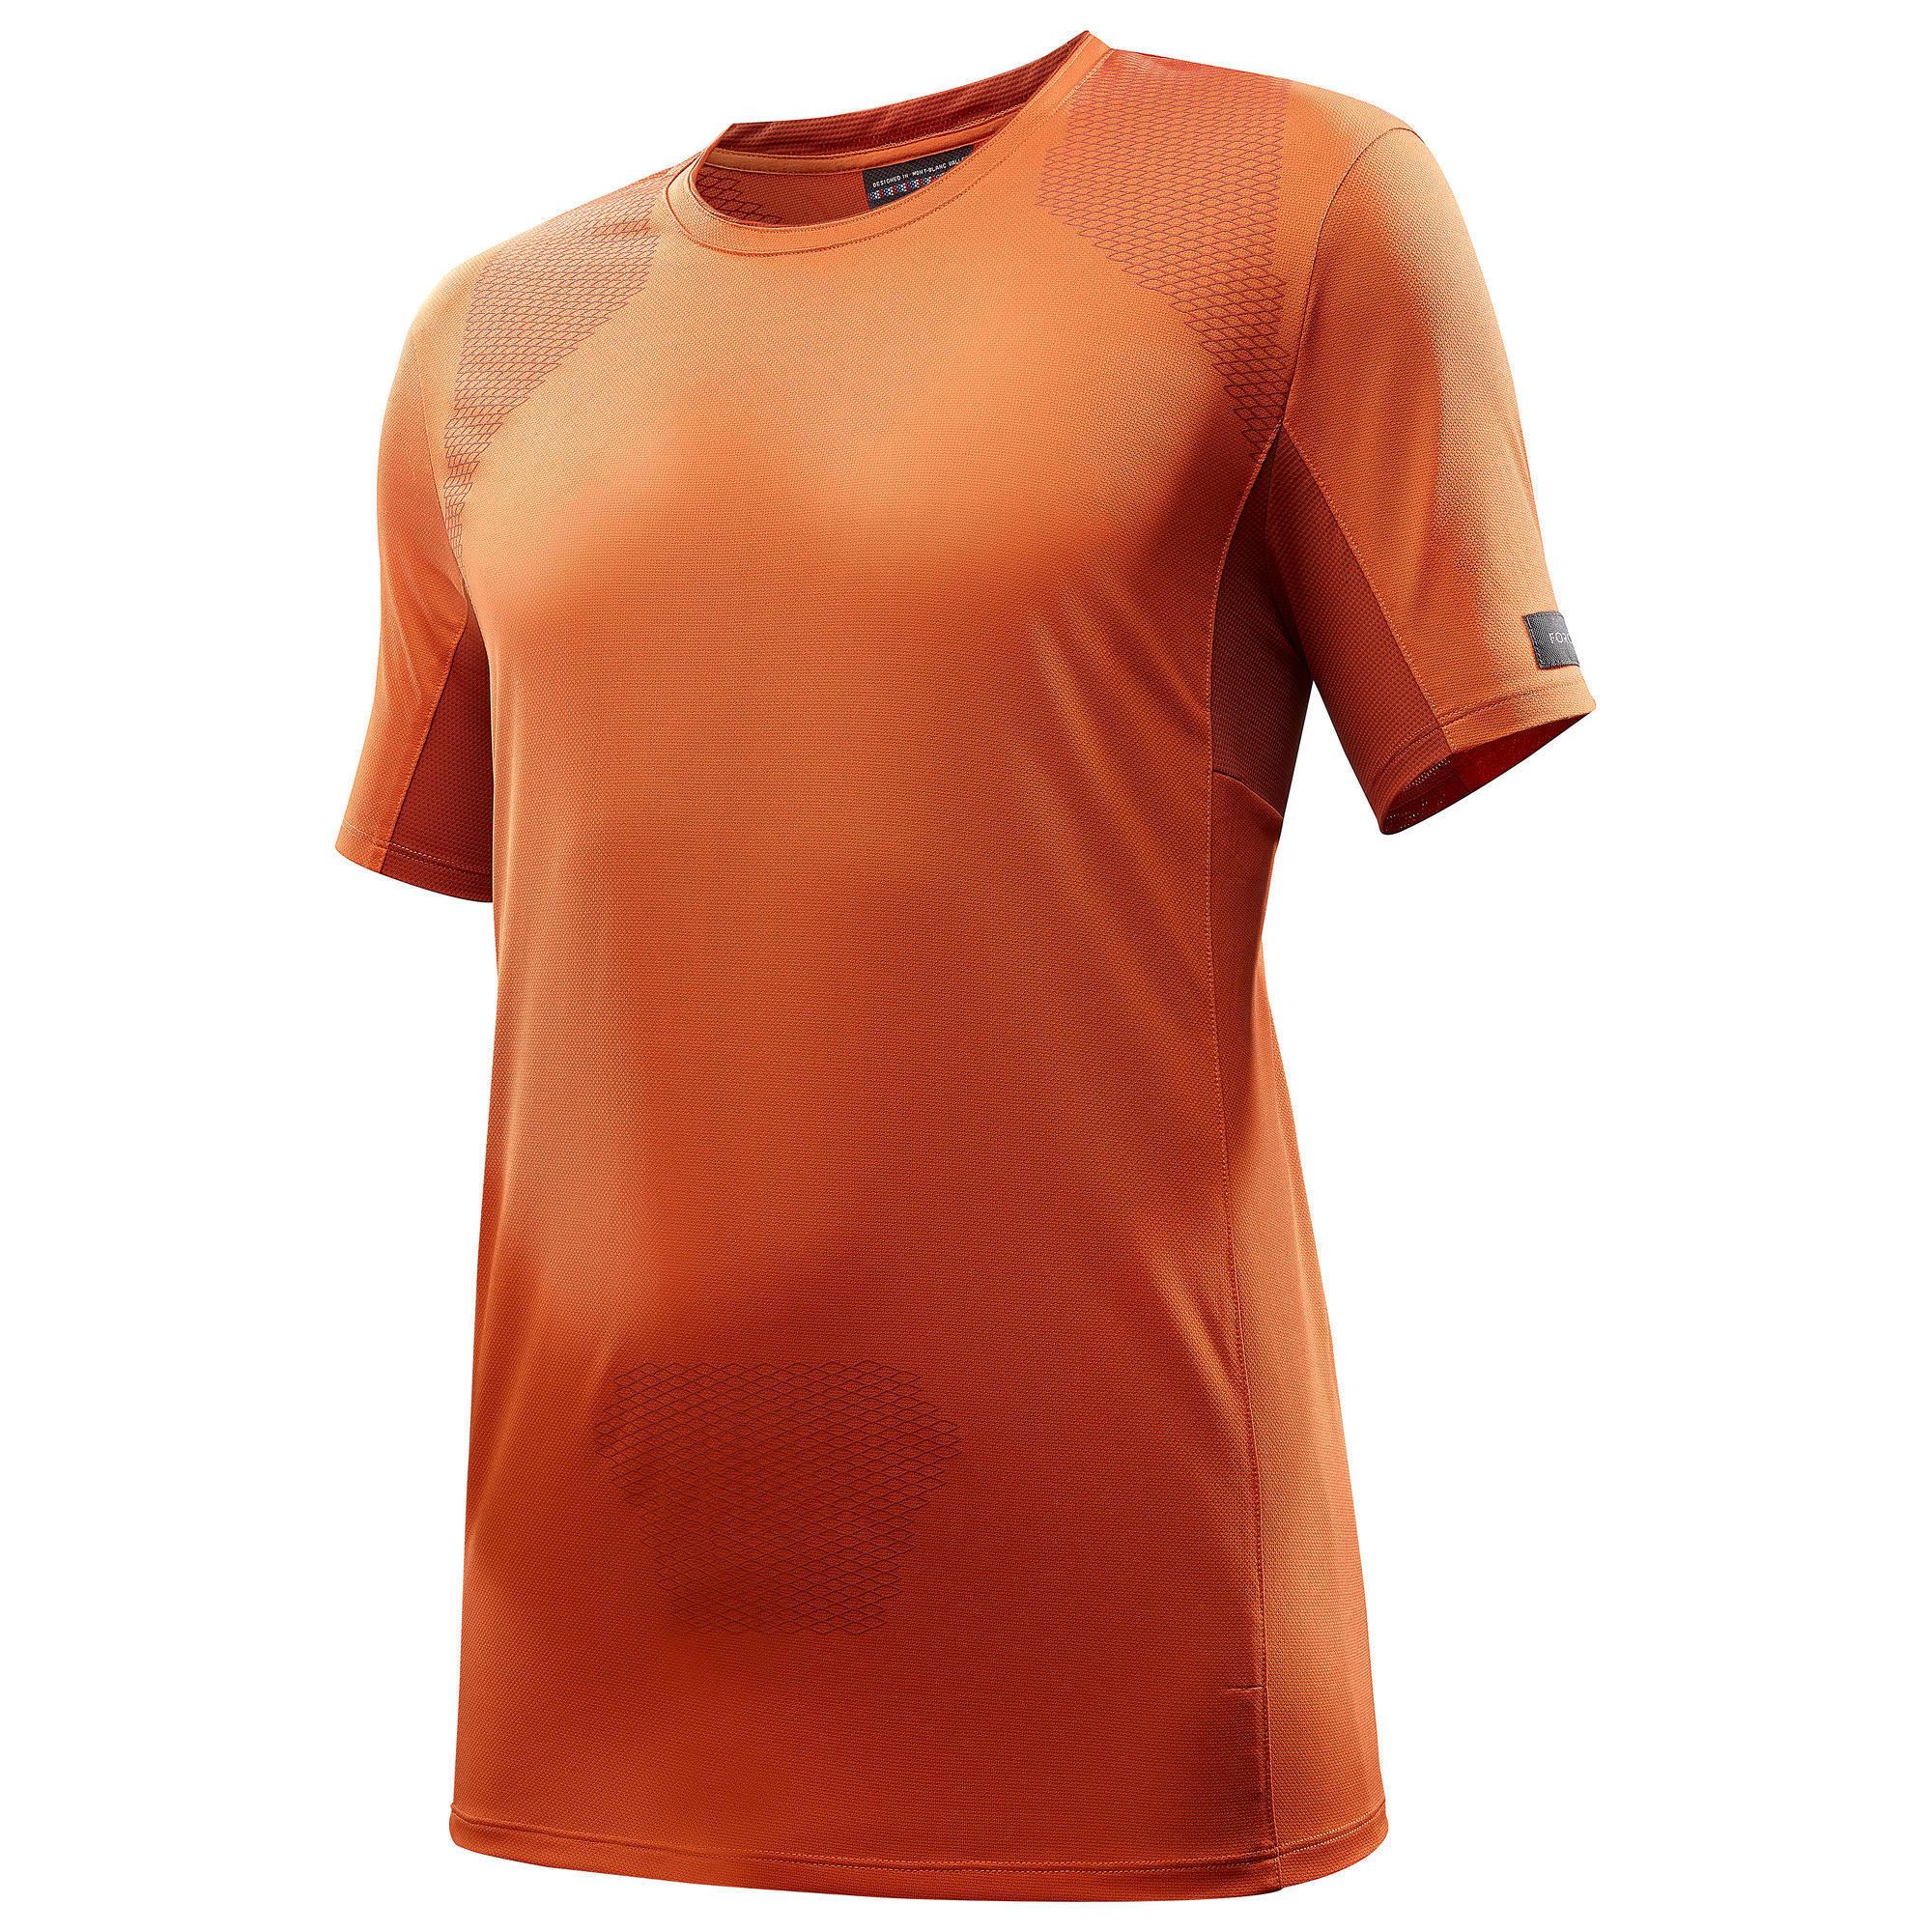 bef0206bbe0 Forclaz Heren T-shirt met korte mouwen voor bergtrekking Trek 500 2554600  Bovenkleding heren Sportkleding heren